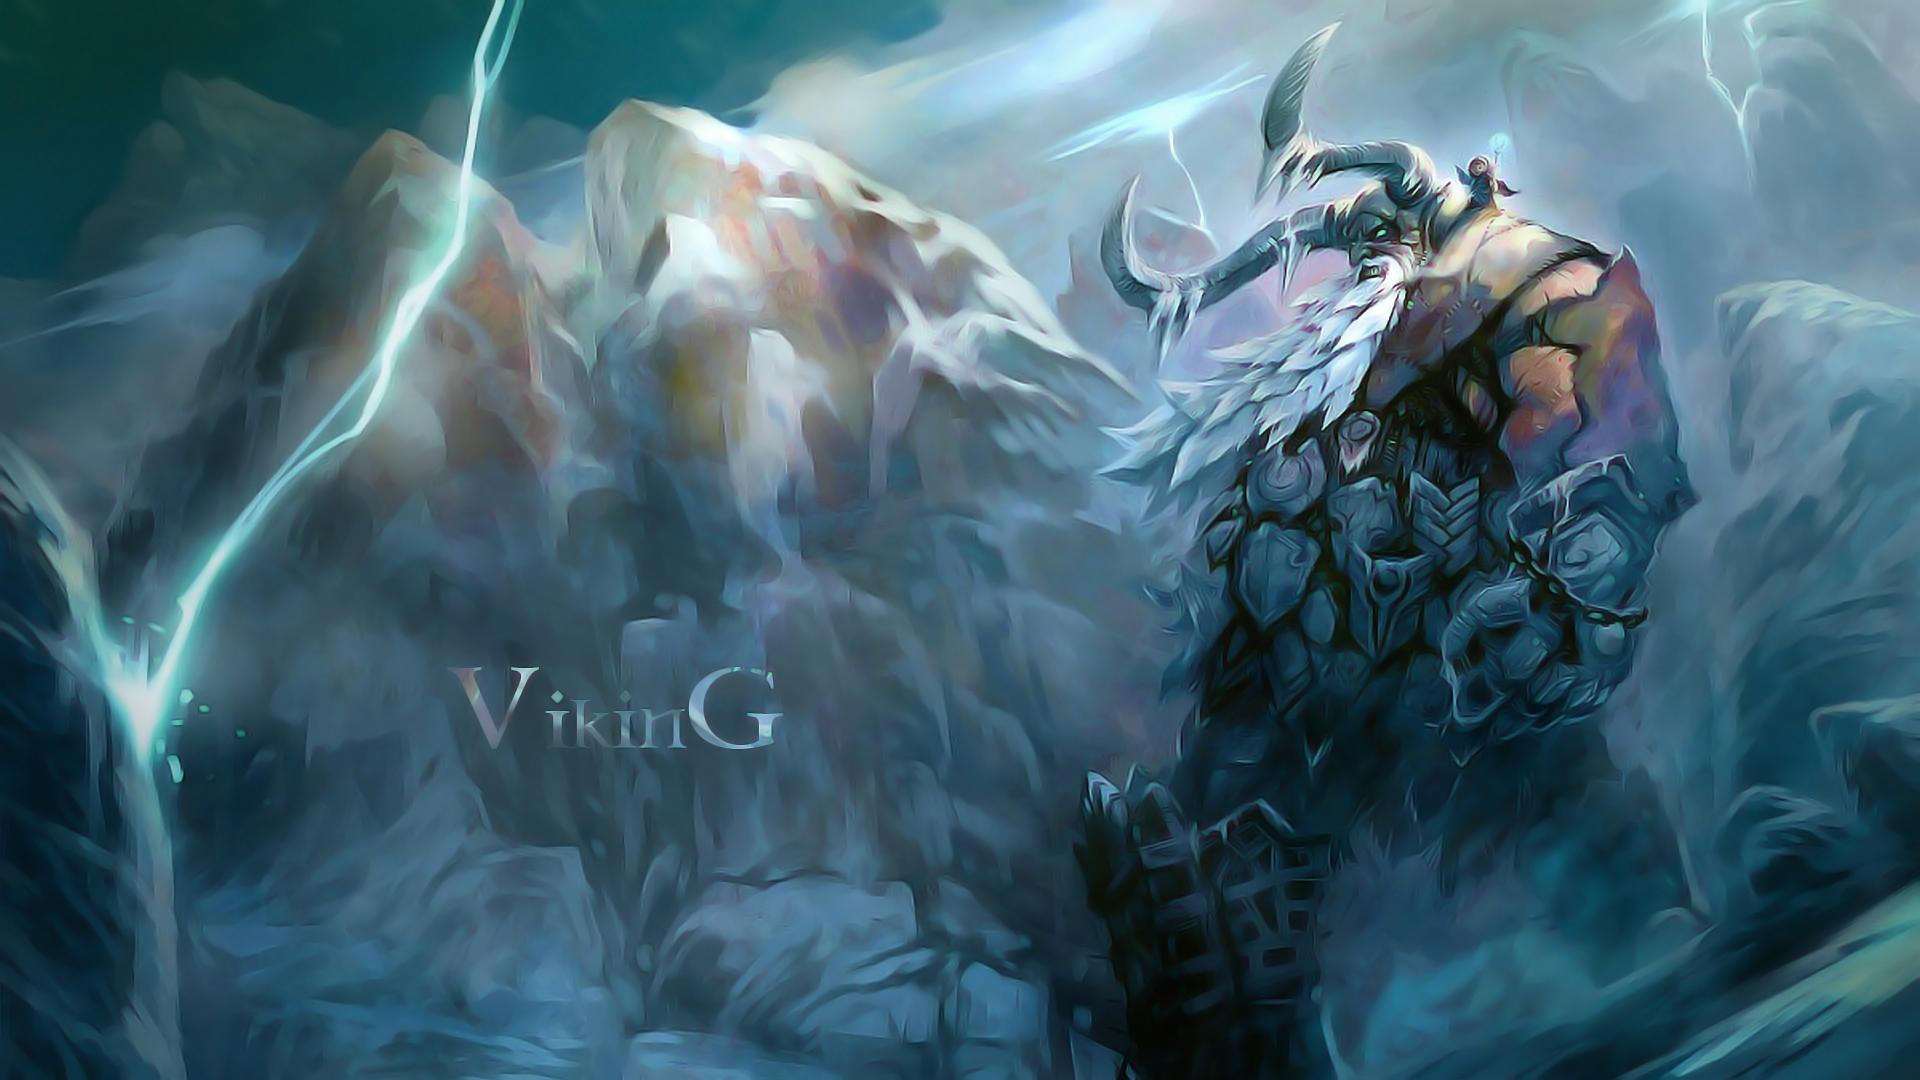 wallpaper viking wallpapers - photo #9